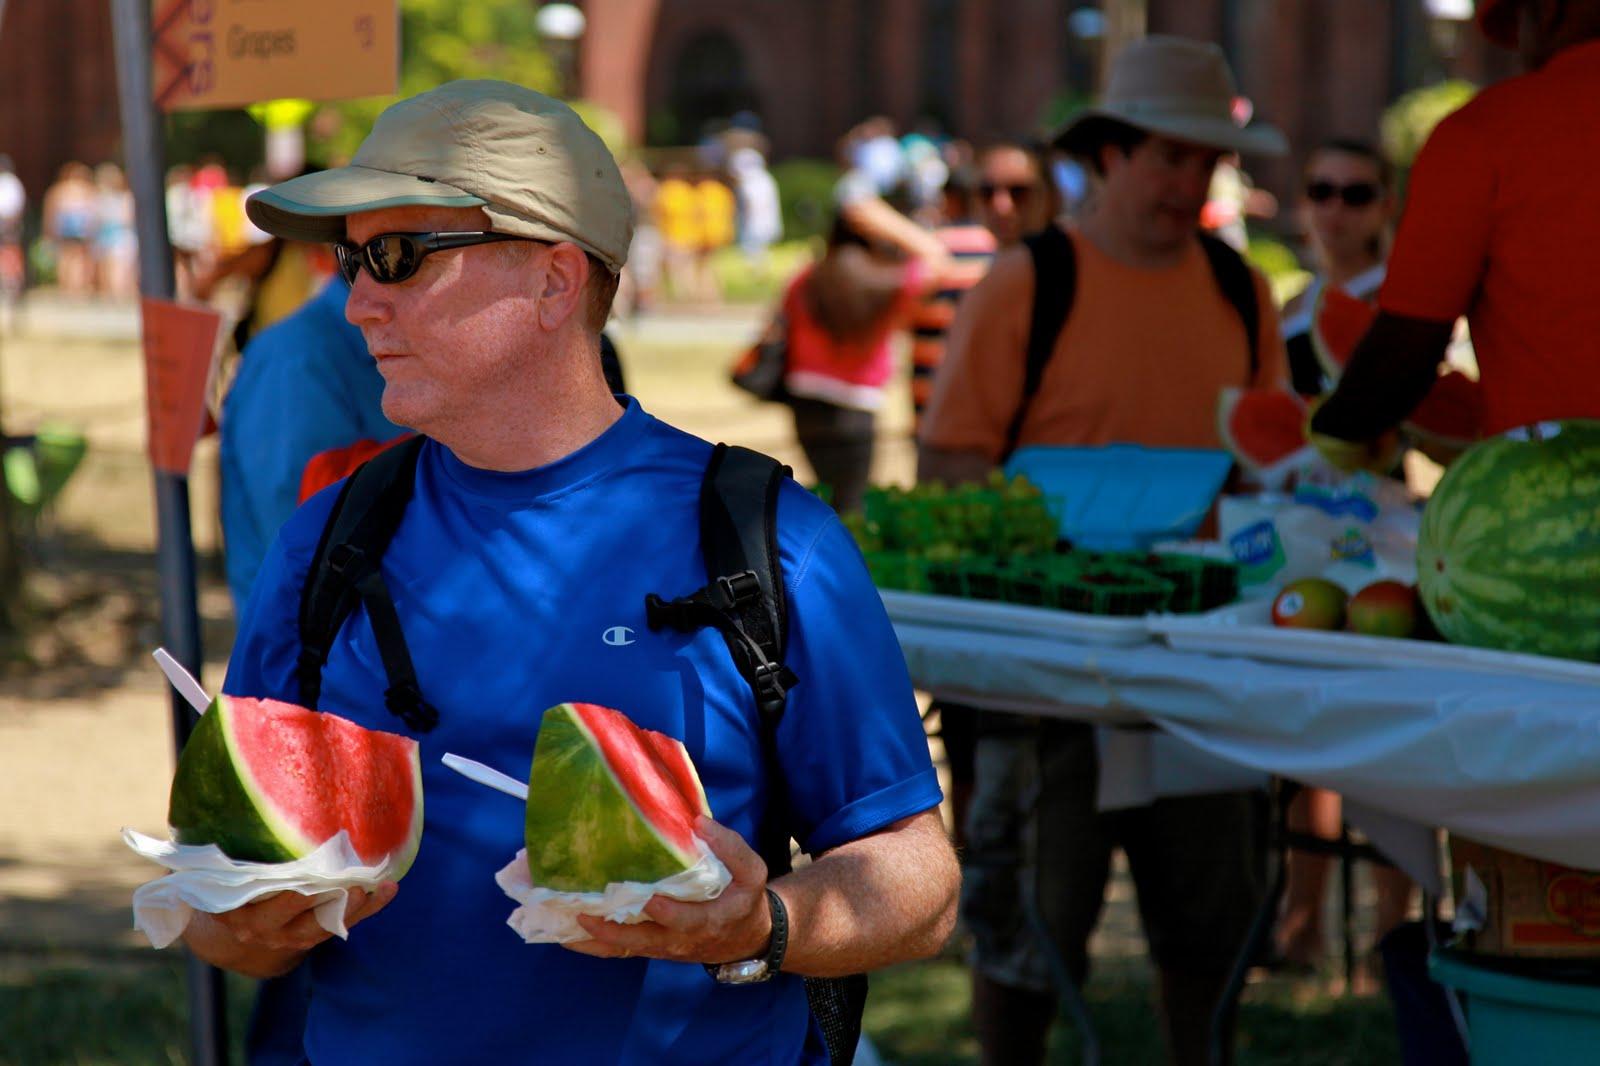 http://3.bp.blogspot.com/_tcD8N36OwG0/TG3ieRHOhUI/AAAAAAAABi8/MFui_hSZBEU/s1600/Watermelon%2Bat%2BArabbers.jpg